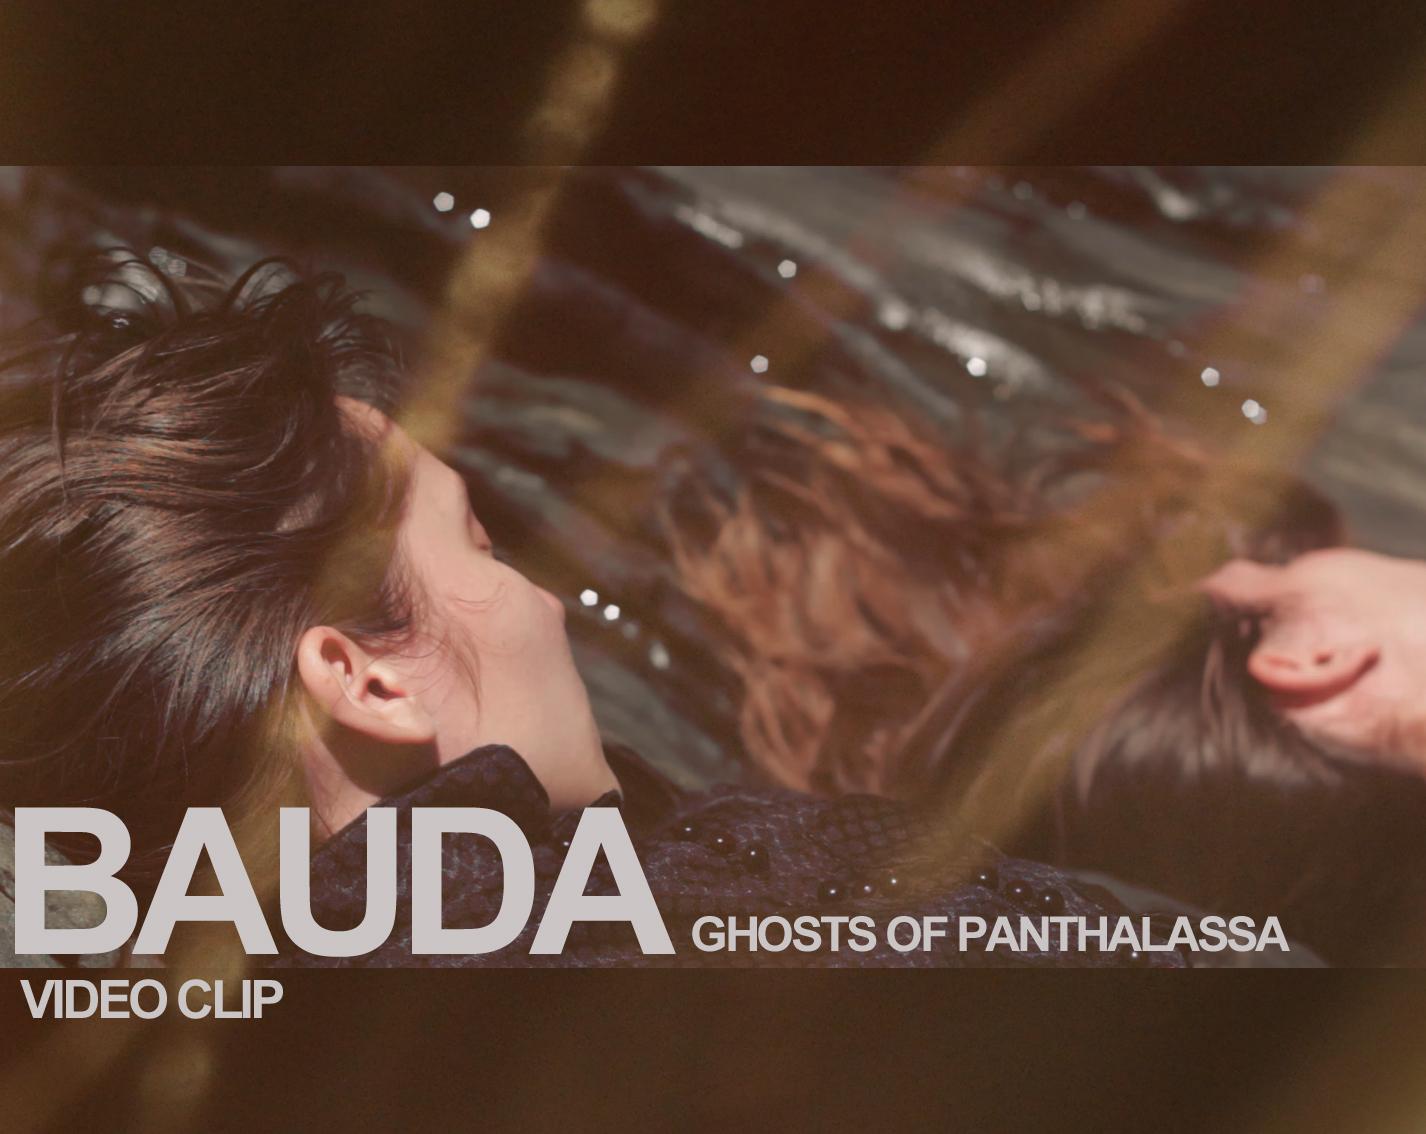 BAUDA LIVE VIDEOS